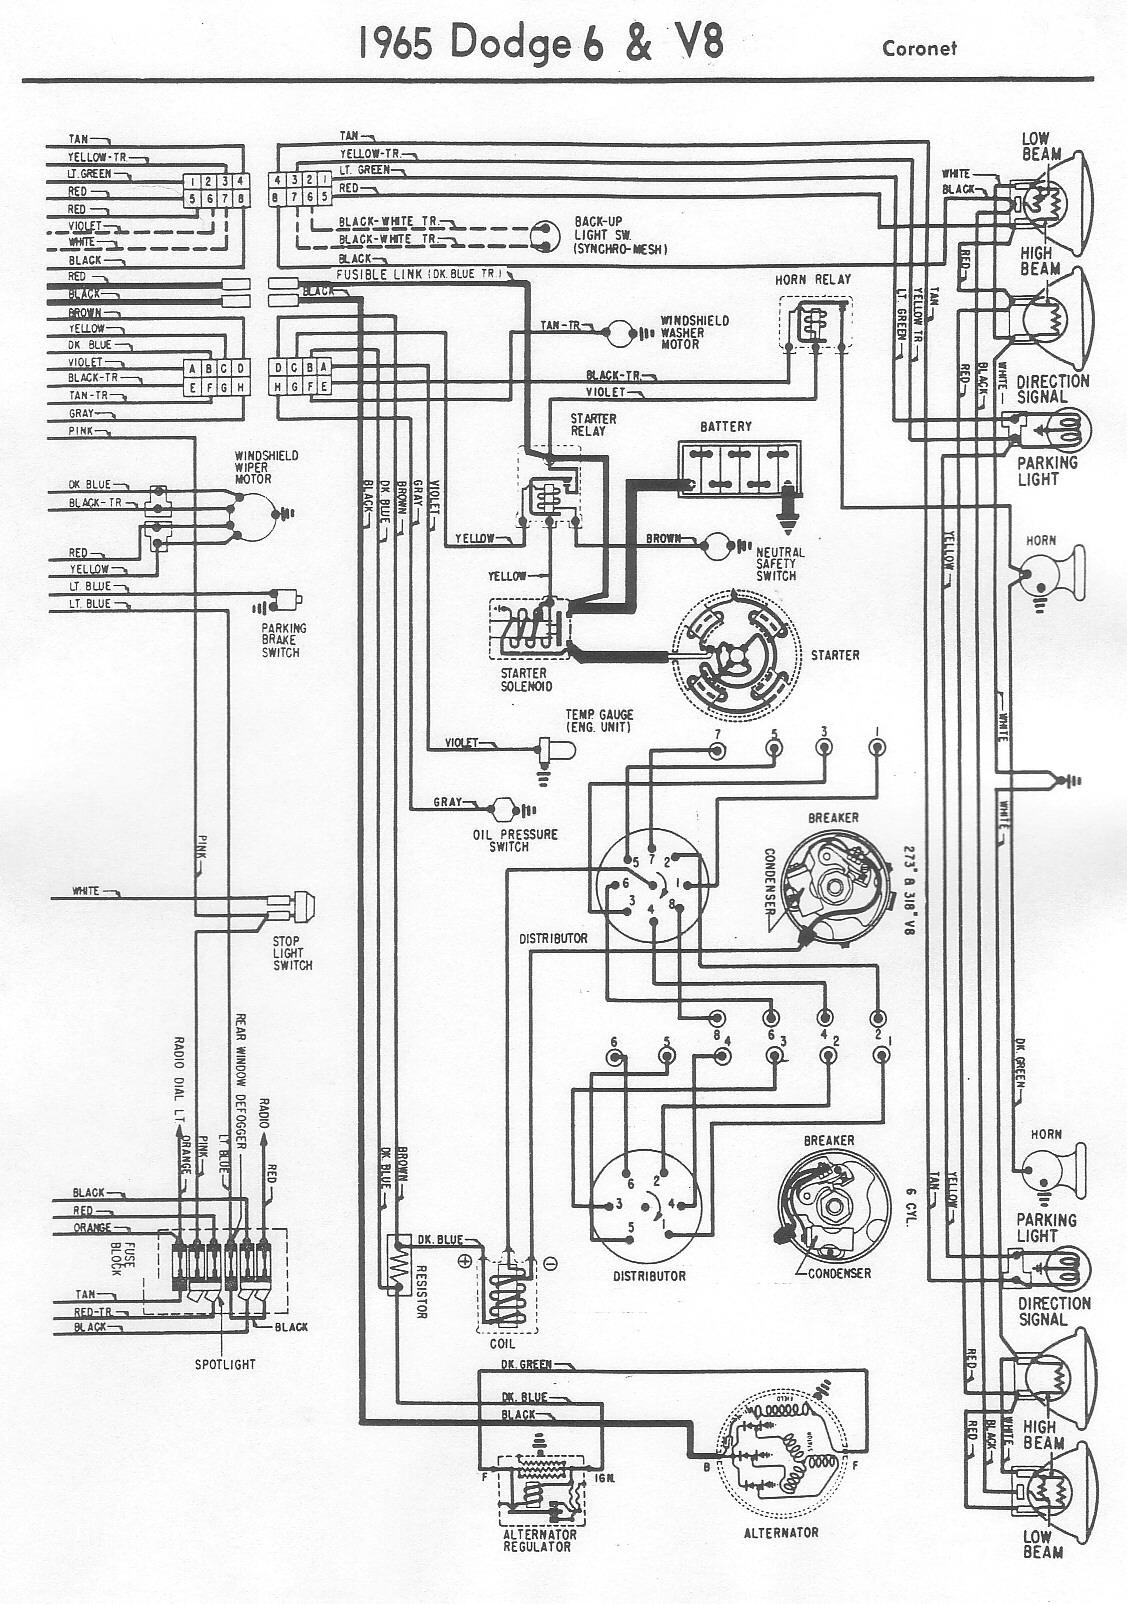 1968 plymouth satellite wiring diagram bg 9395  426 hemi engine wiring diagram schematic wiring  bg 9395  426 hemi engine wiring diagram